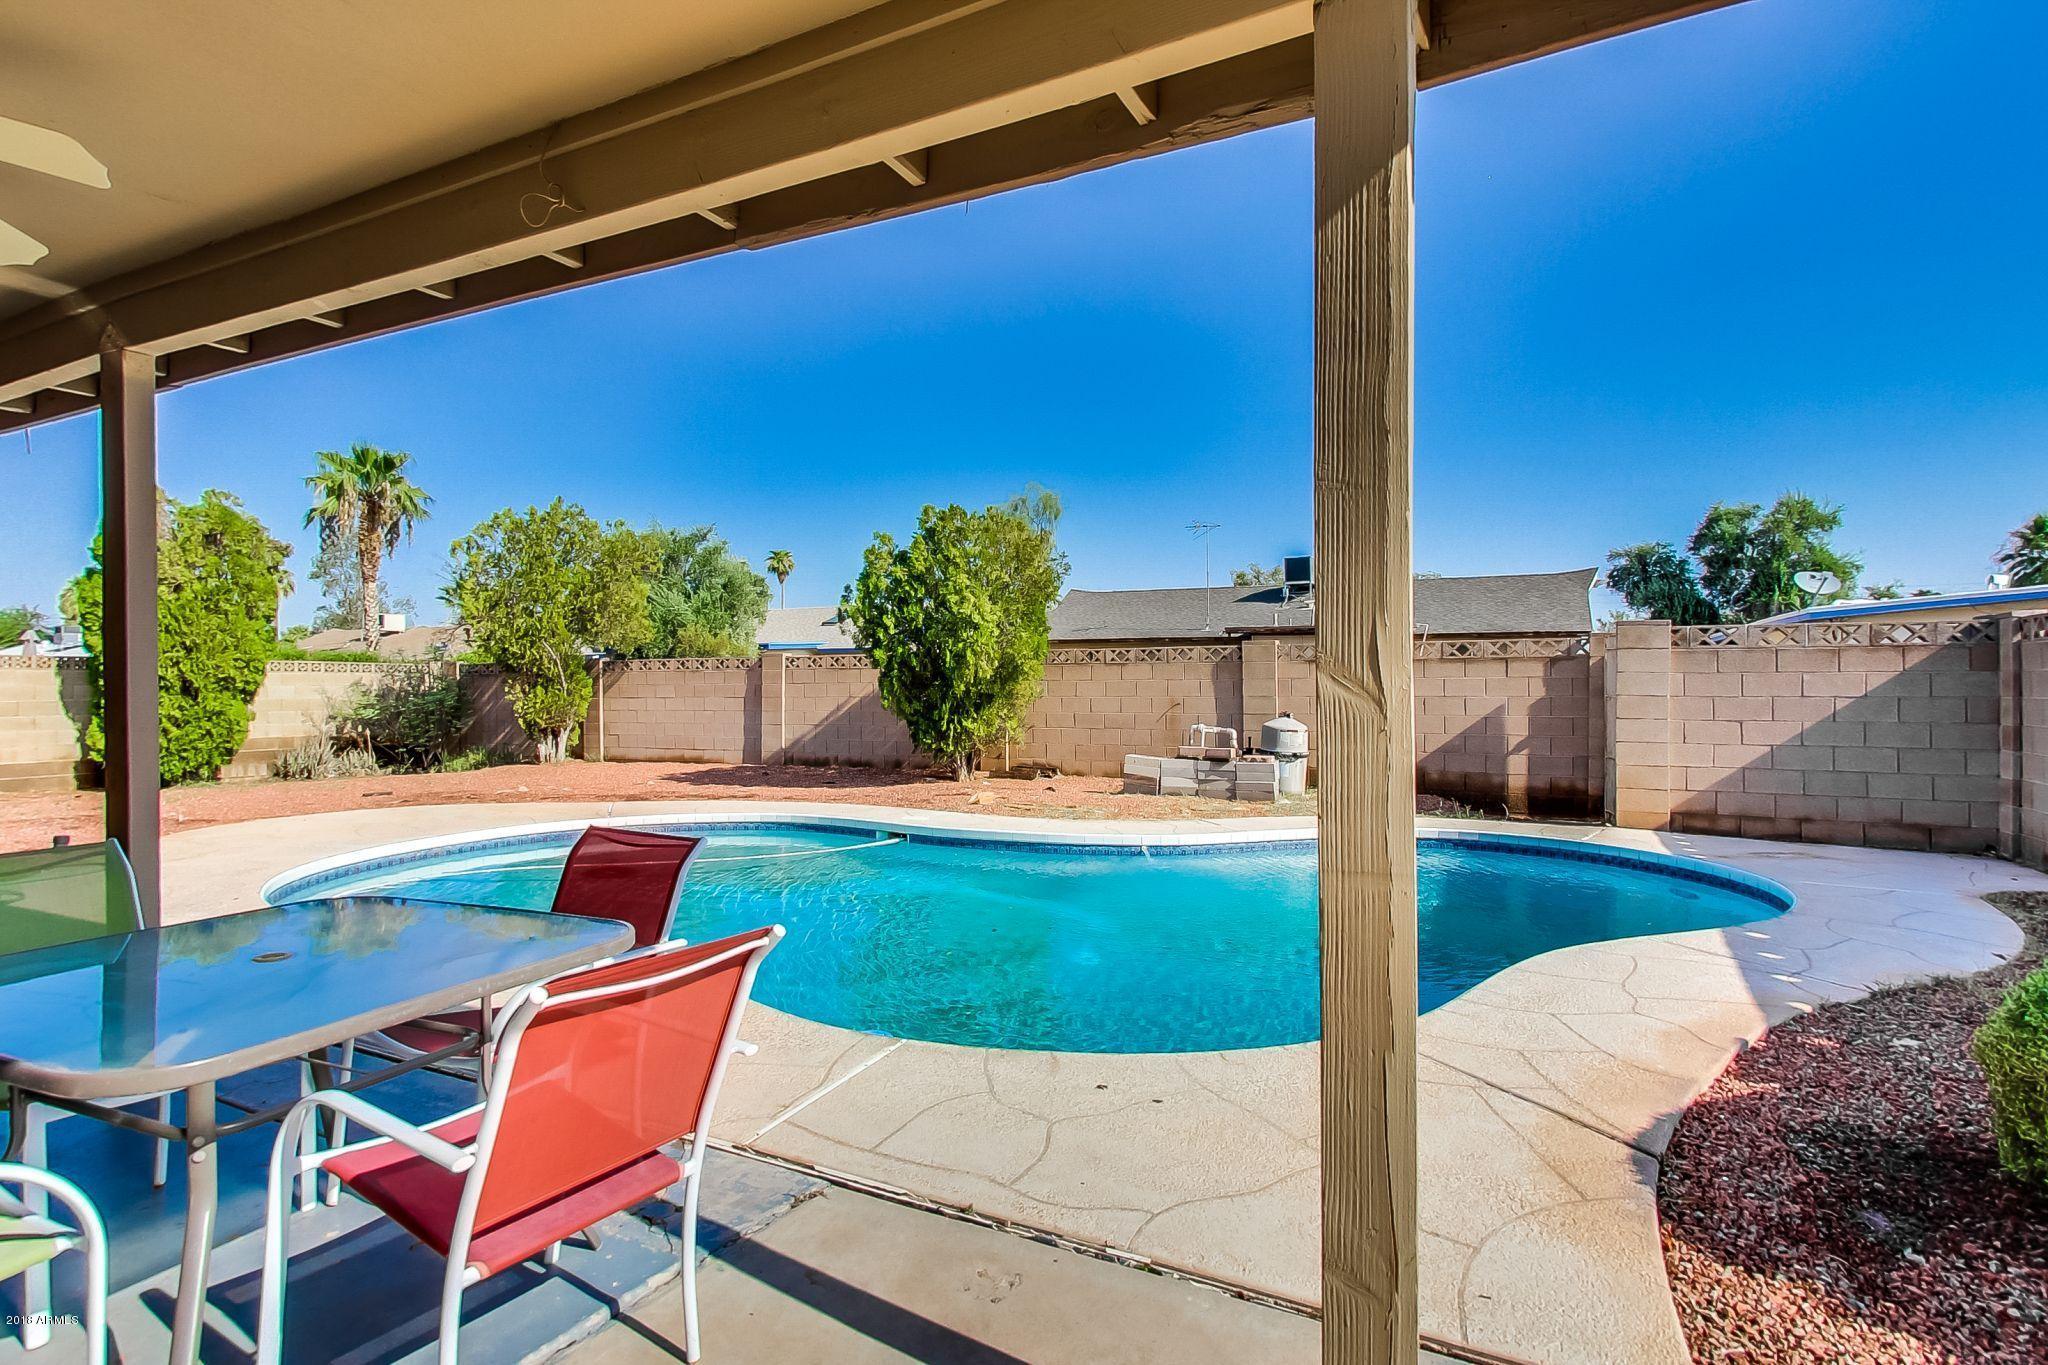 MLS 5807452 1516 E PALMCROFT Drive, Tempe, AZ 85282 Tempe AZ Hughes Acres